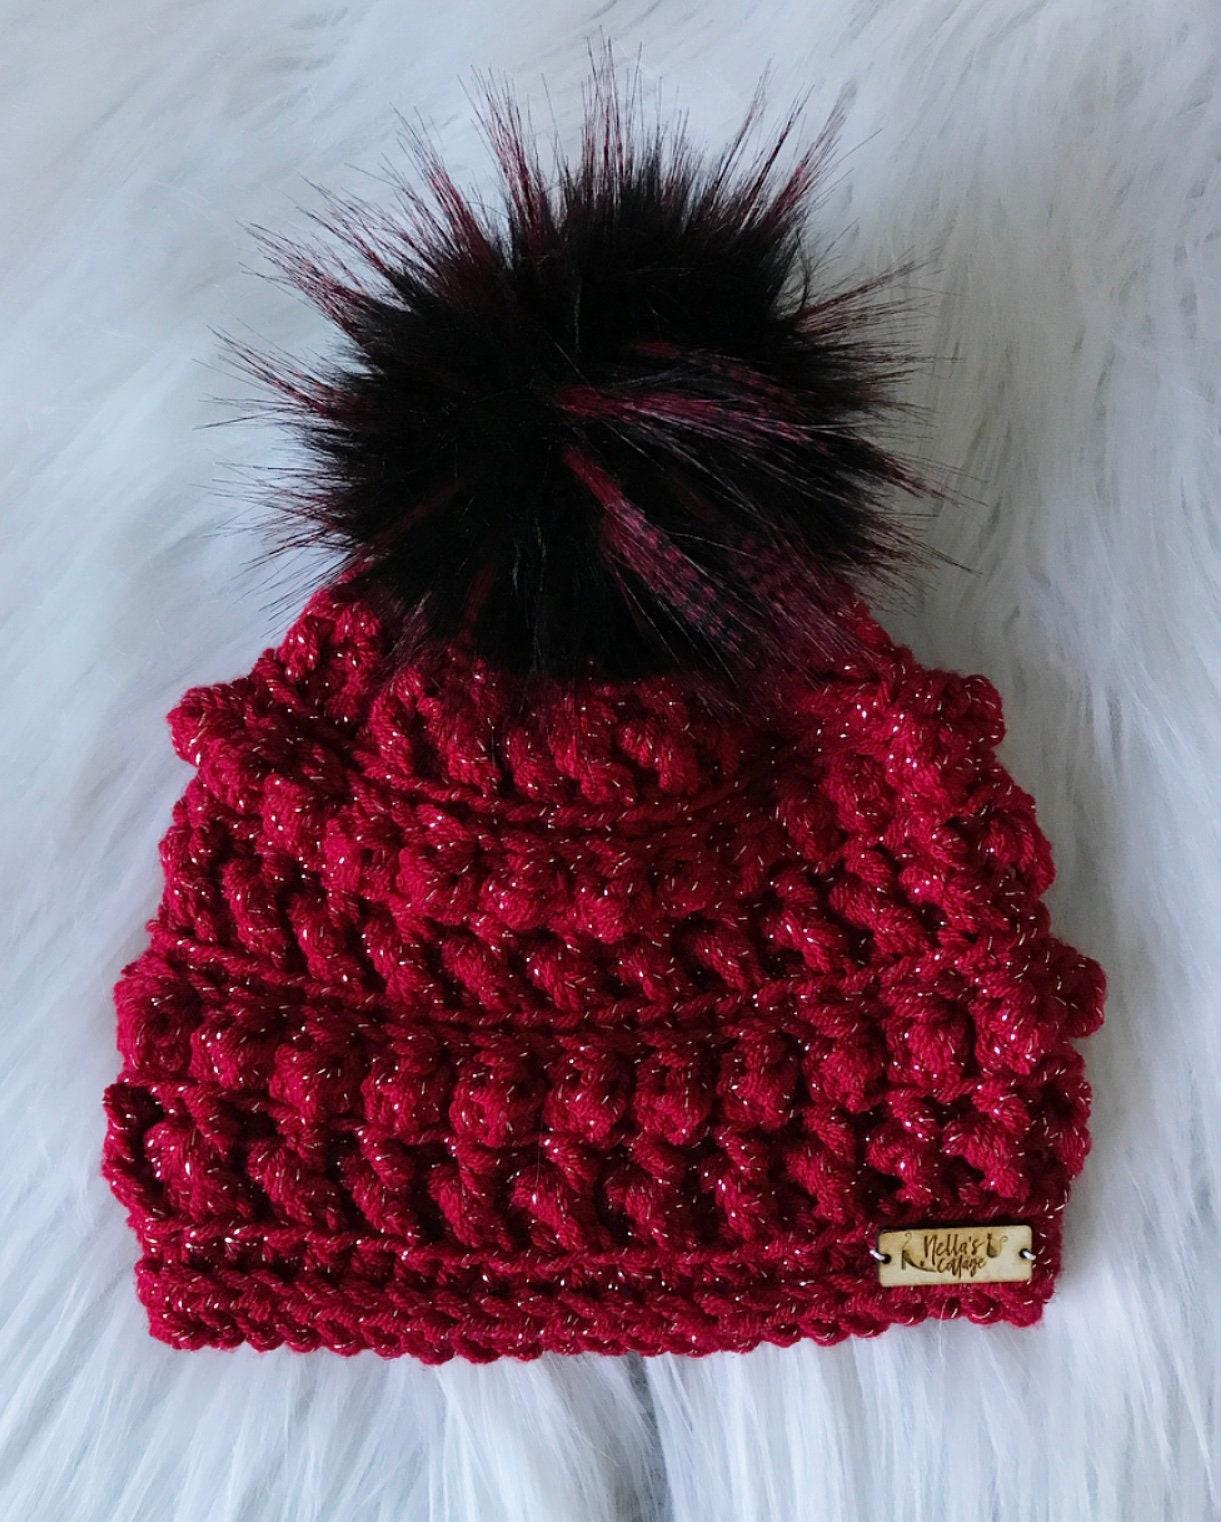 db0503802b3 Sparkle Cranberry Beanie - Handmade Hat - Handmade Beanie - Crocheted Beanie  - Winter Hats - Faux Fur - Gifts for Her